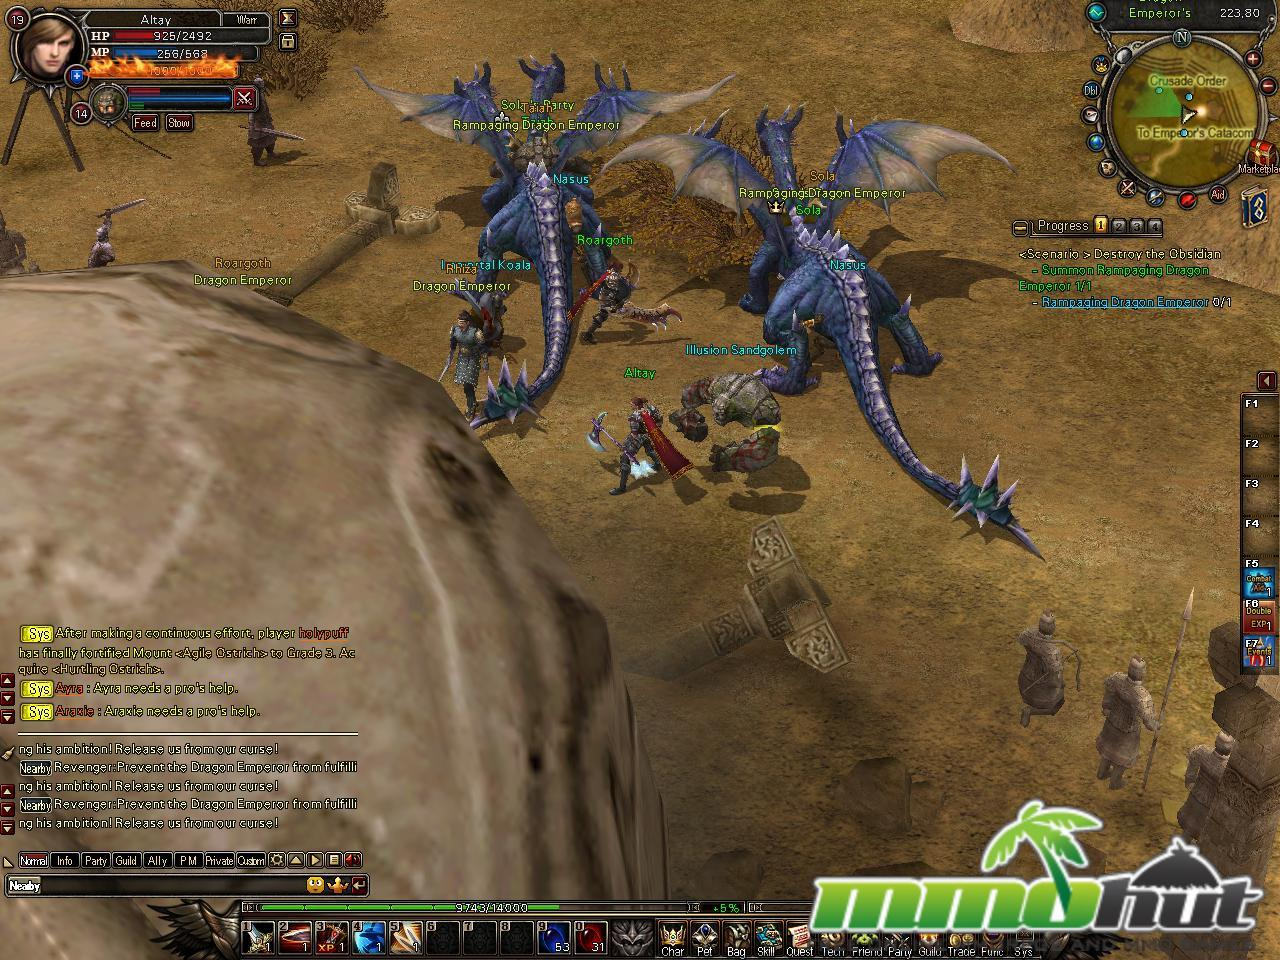 Top 10 Best 3D MMORPGs / MMOs Battle of the Immortals